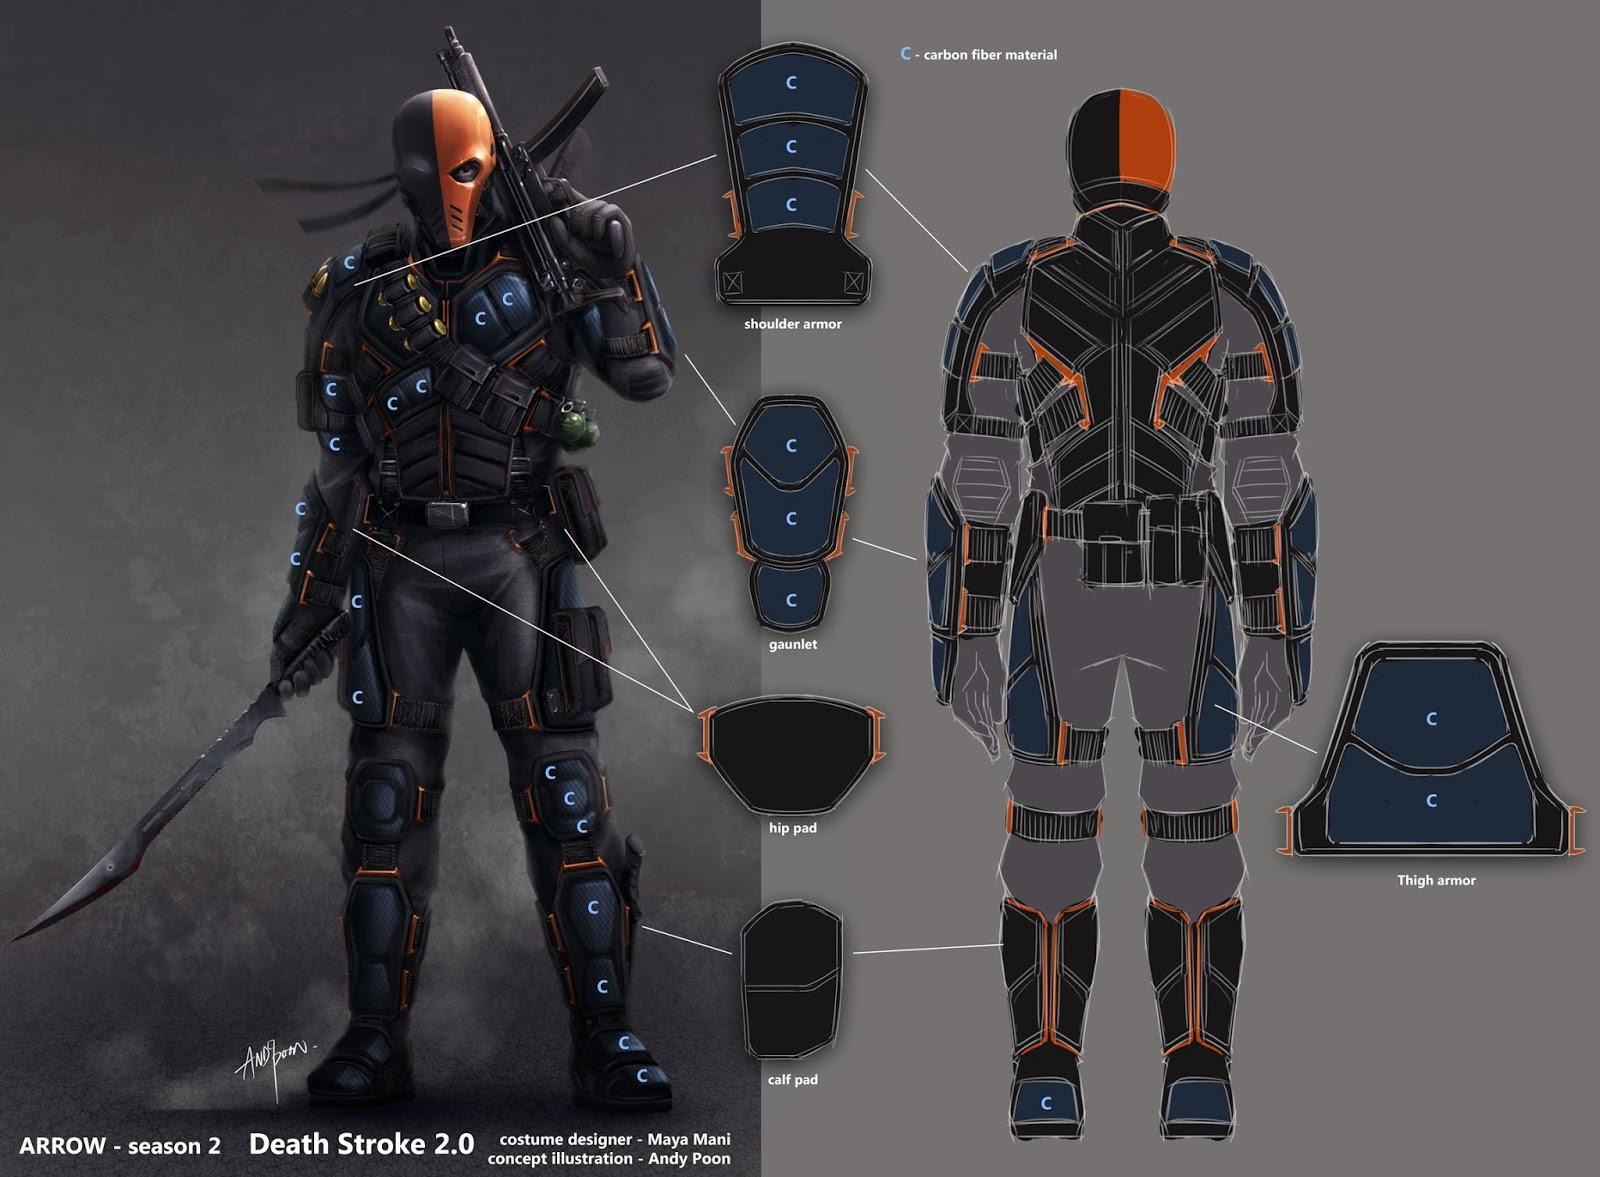 Deathstroke Helmet from DC Comics